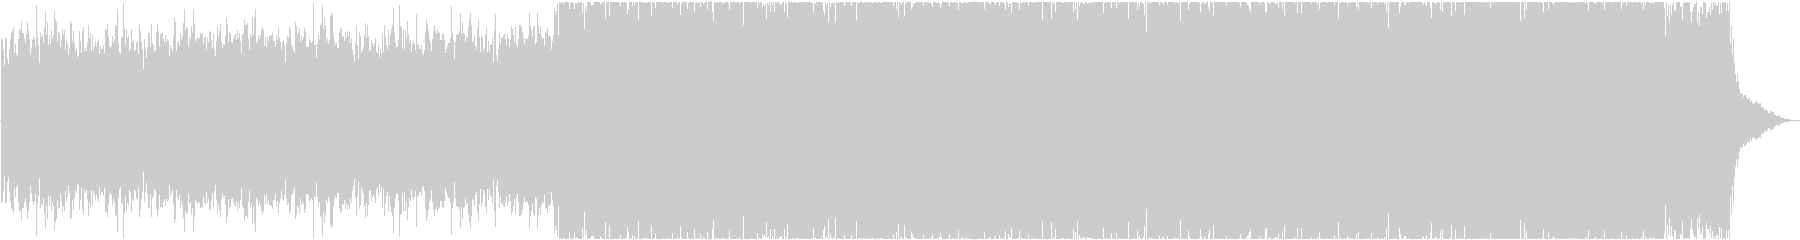 News12 事件・事故・covid19の未再生の波形